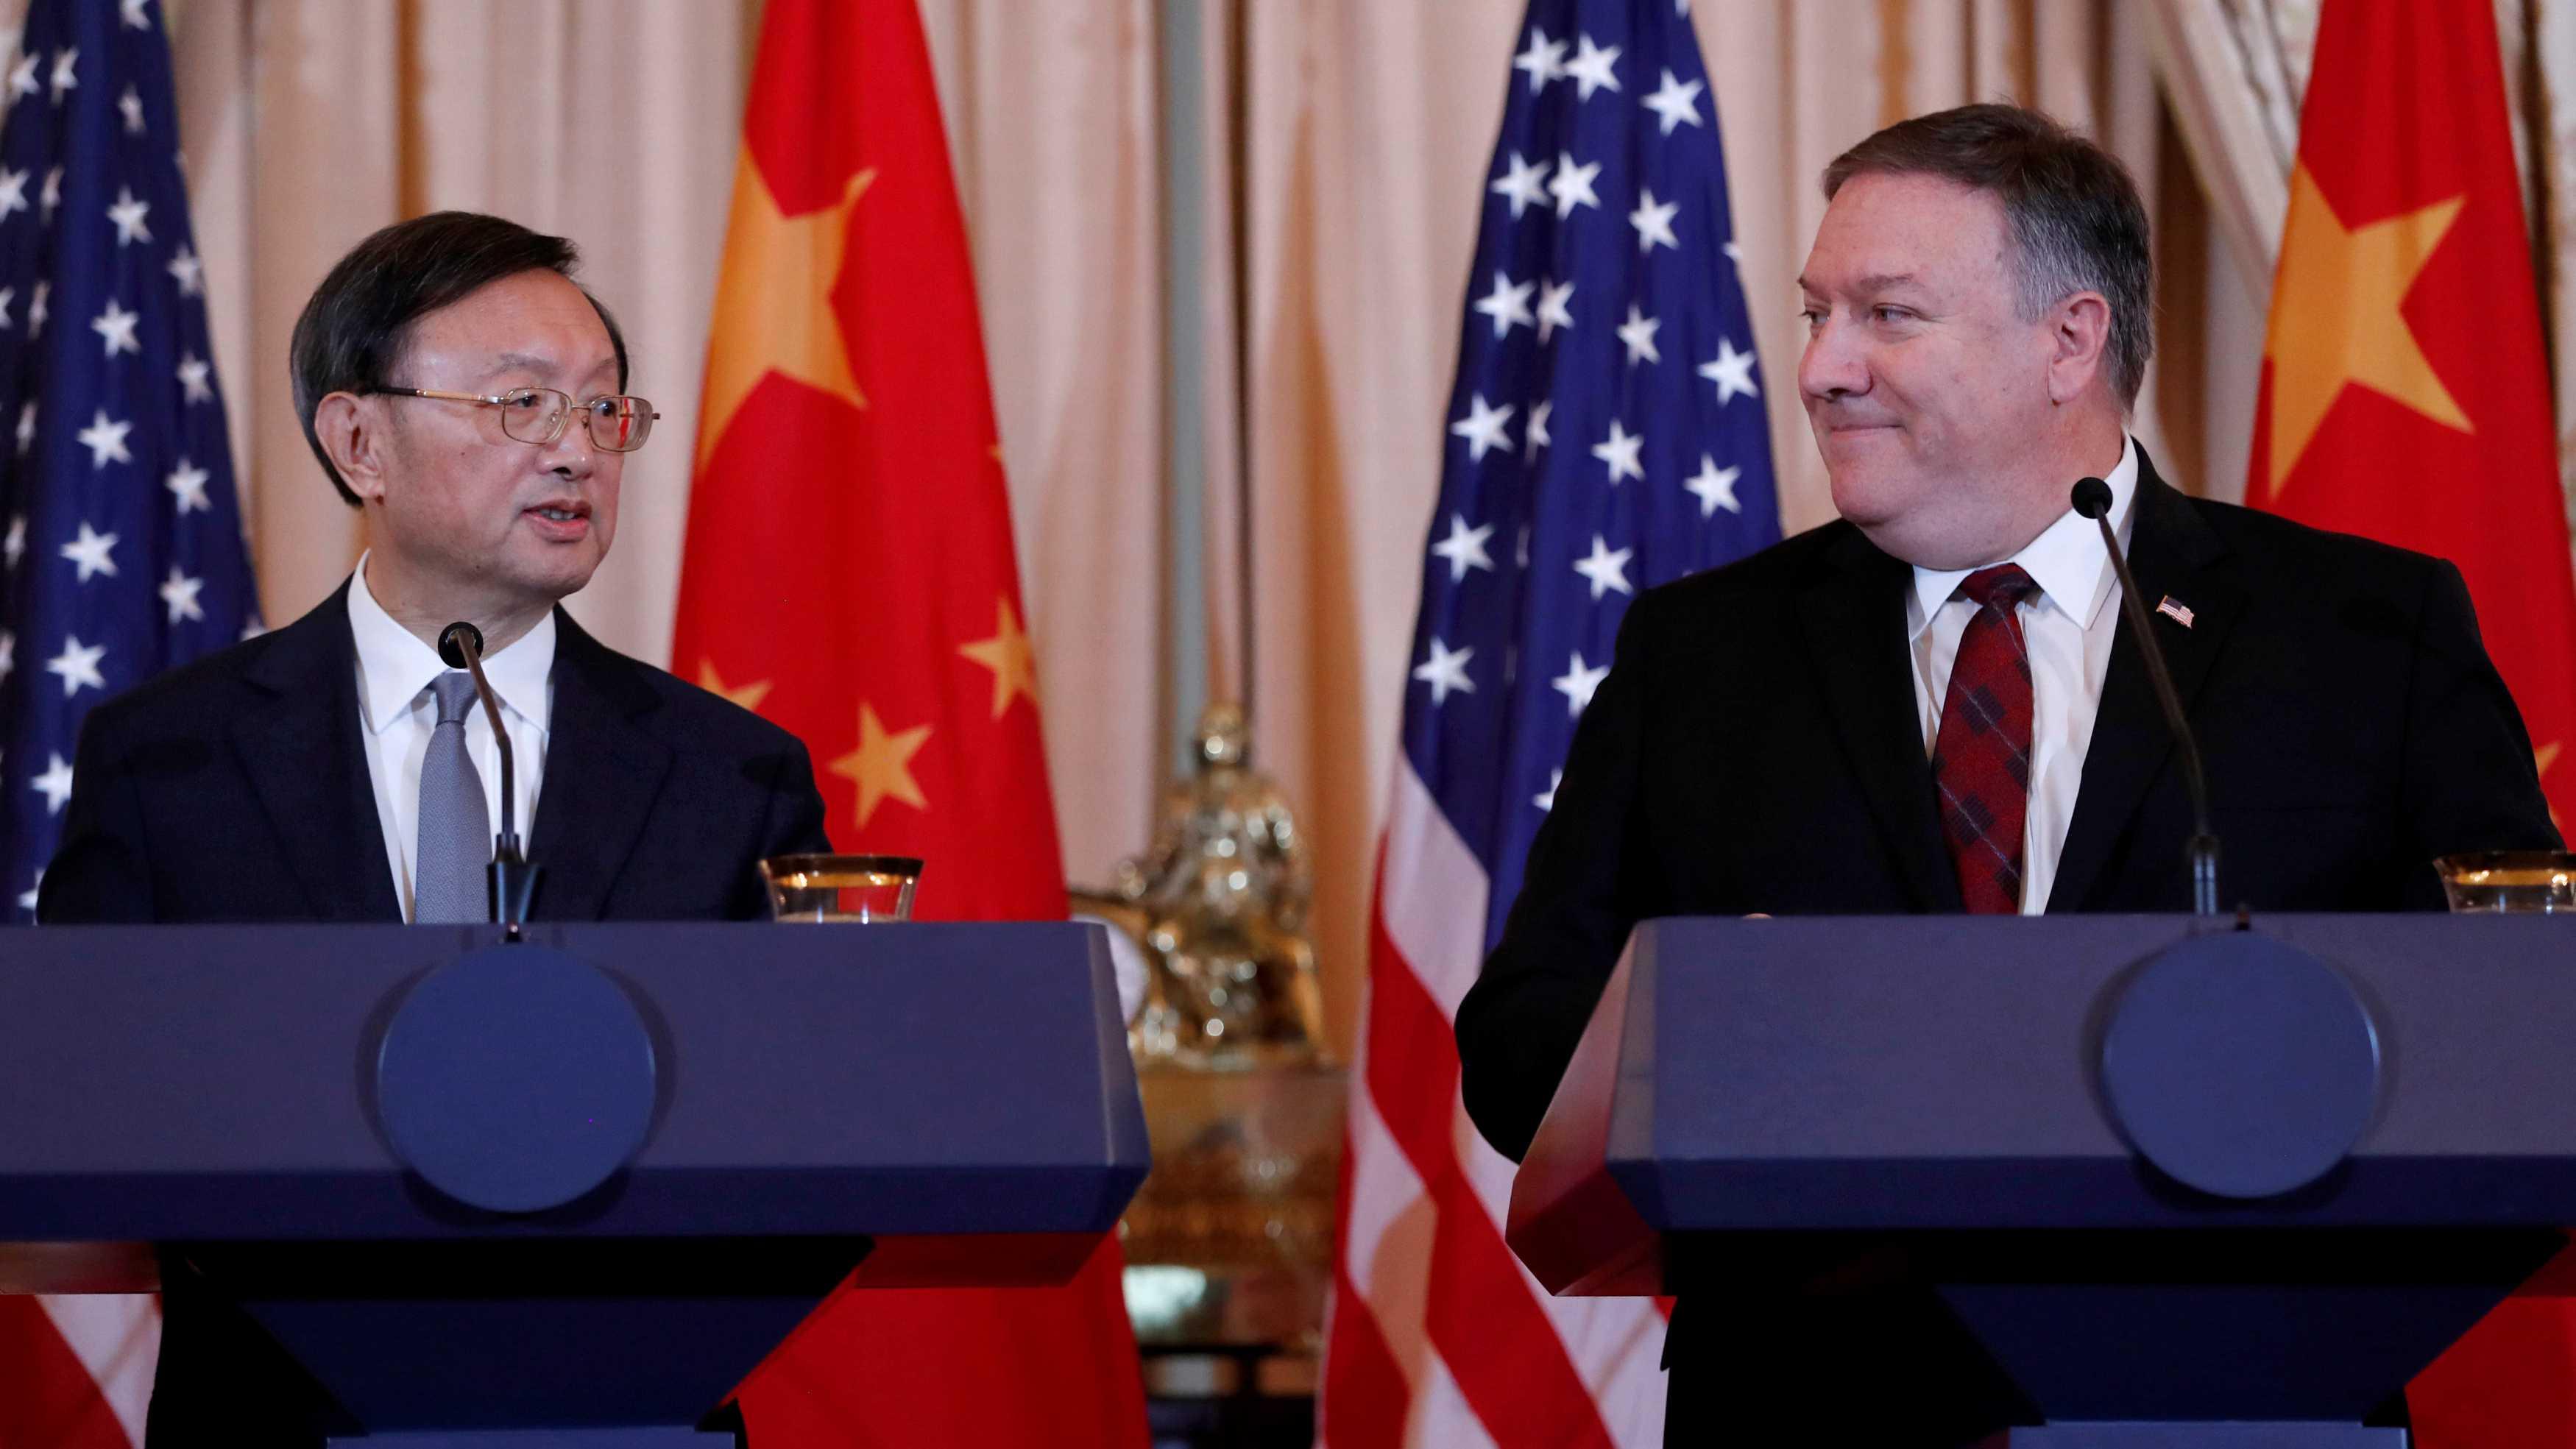 China tells US Xi-Trump meeting at G20 is critical to bilateral ties